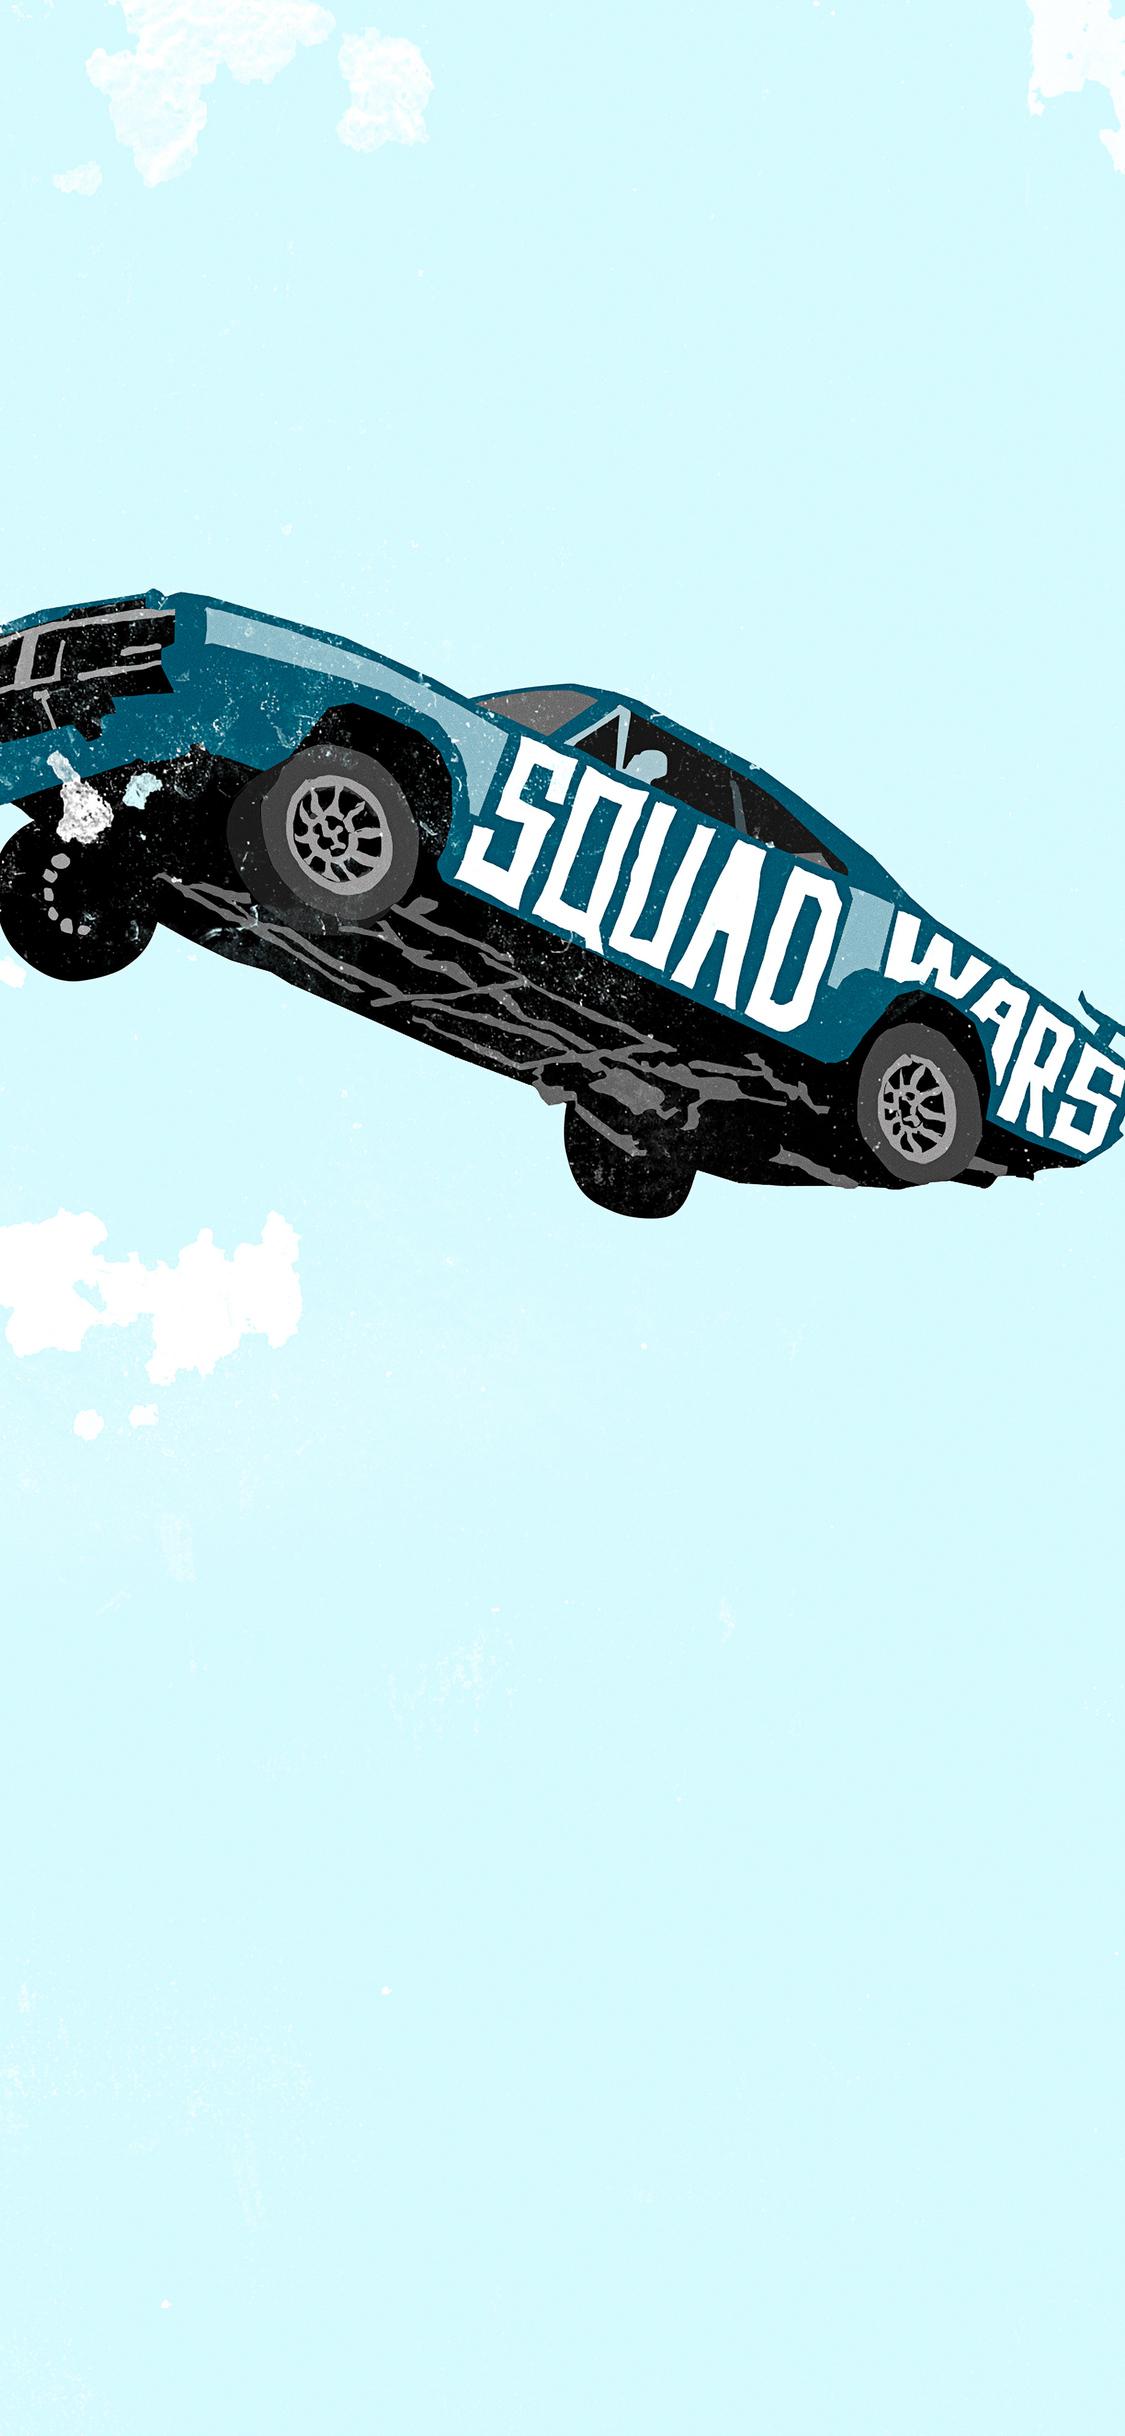 squad-wars-tv-series-37.jpg